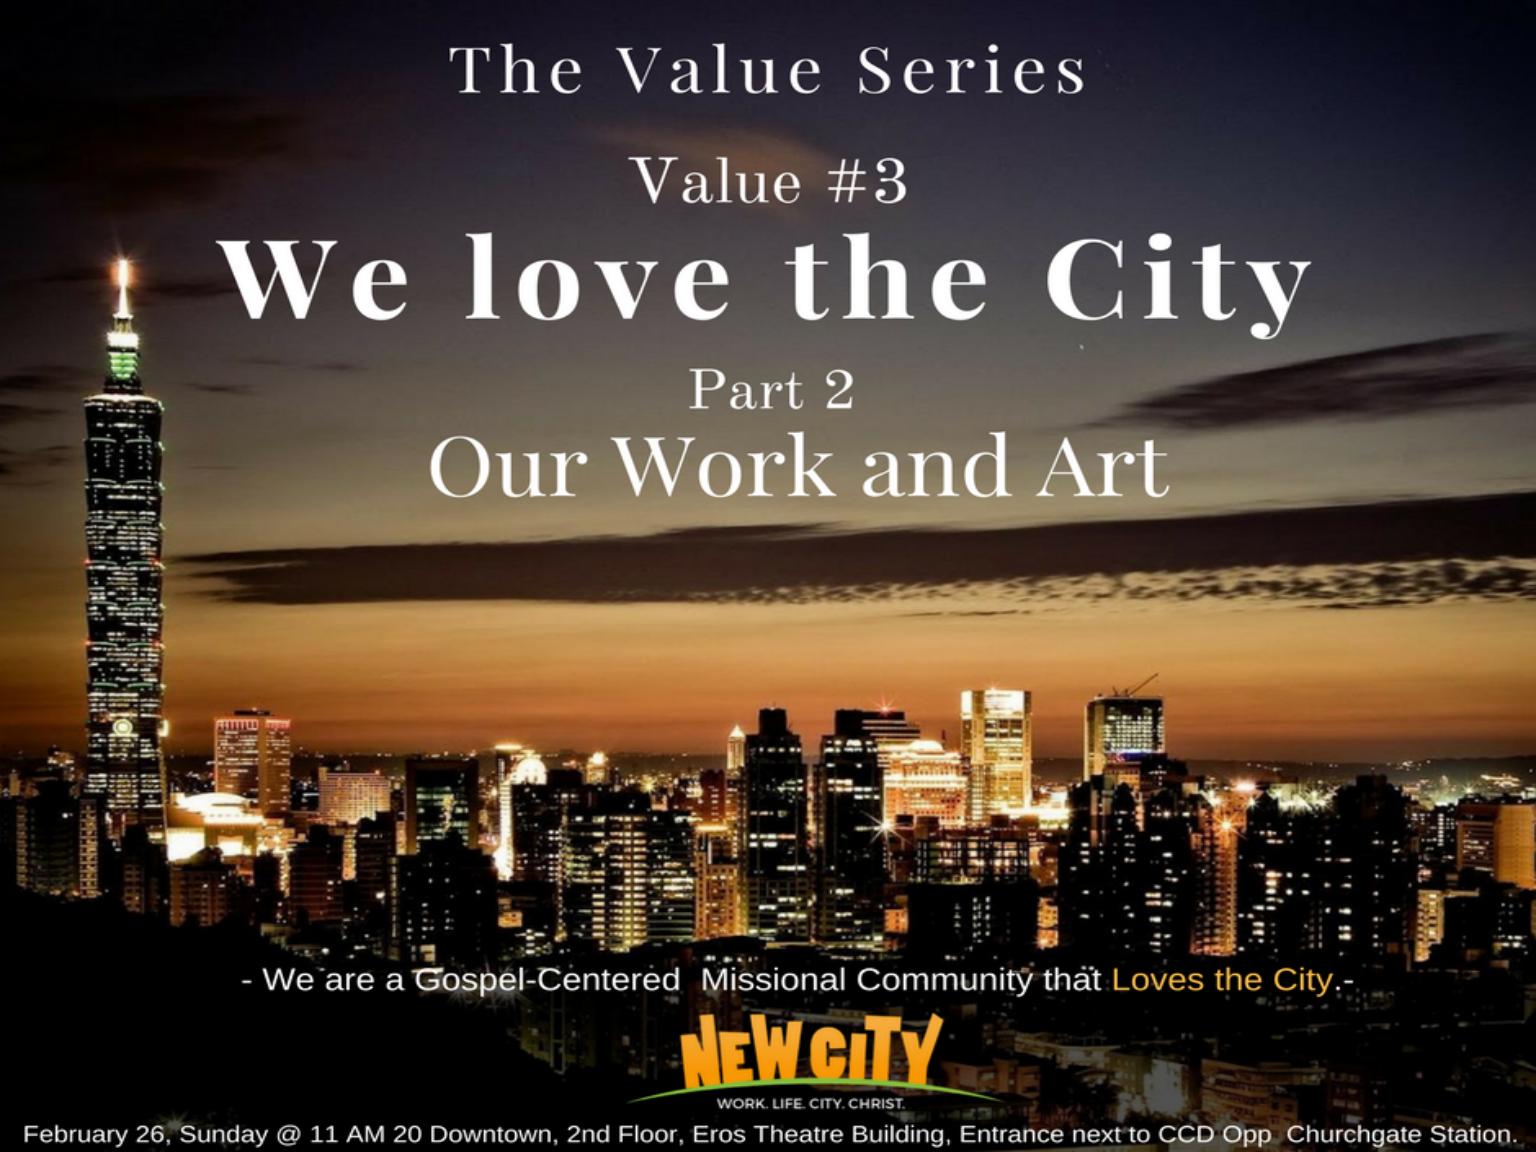 We love the City (Part 2) Image